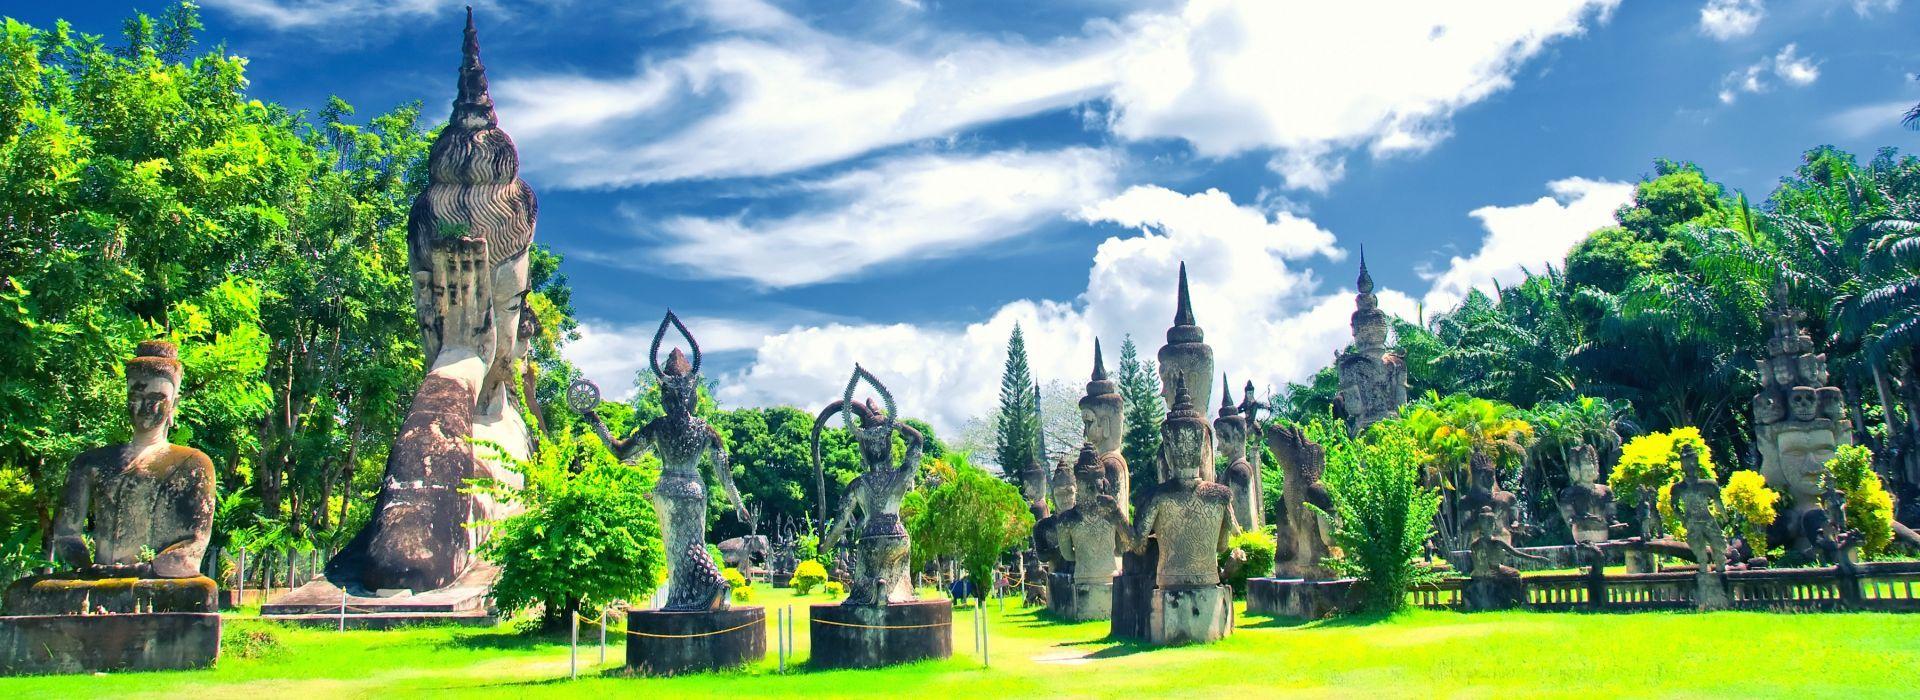 City sightseeing Tours in Vientiane